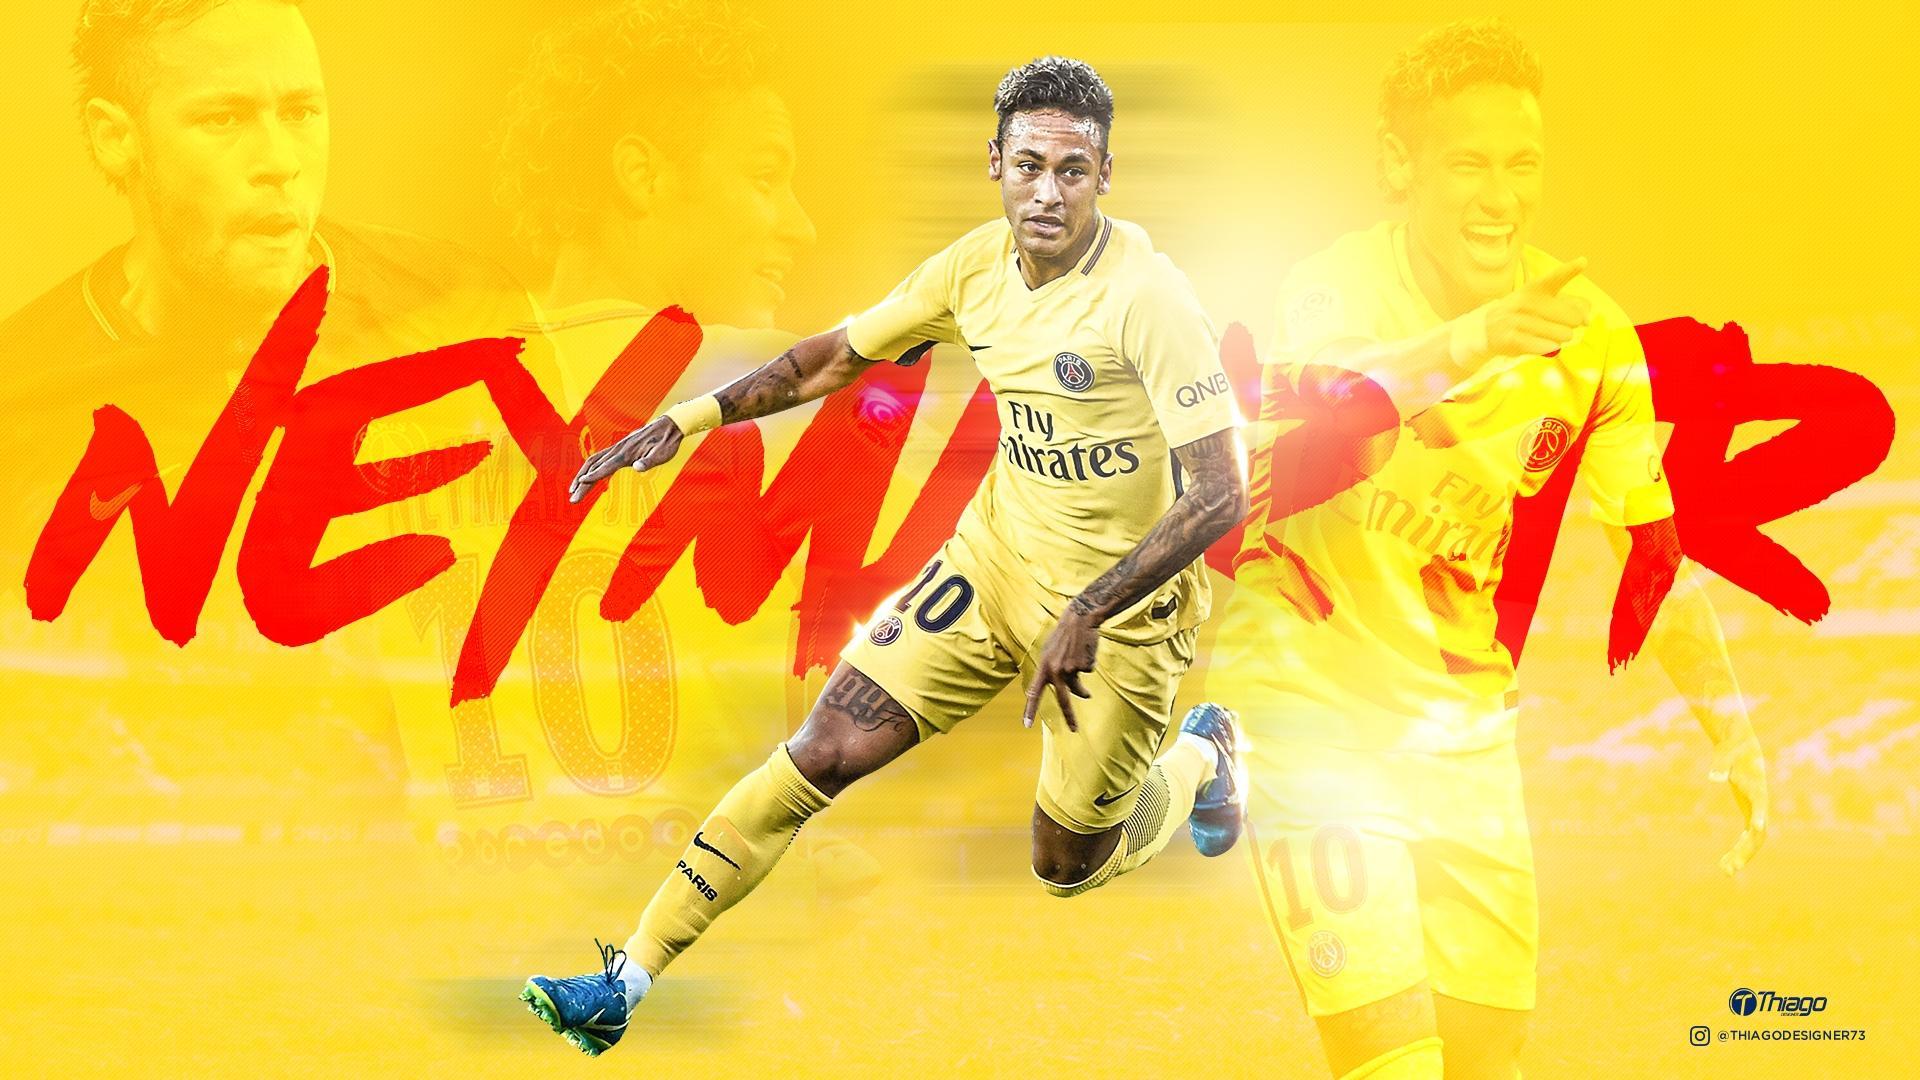 neymar wallpaper hd backgrounds